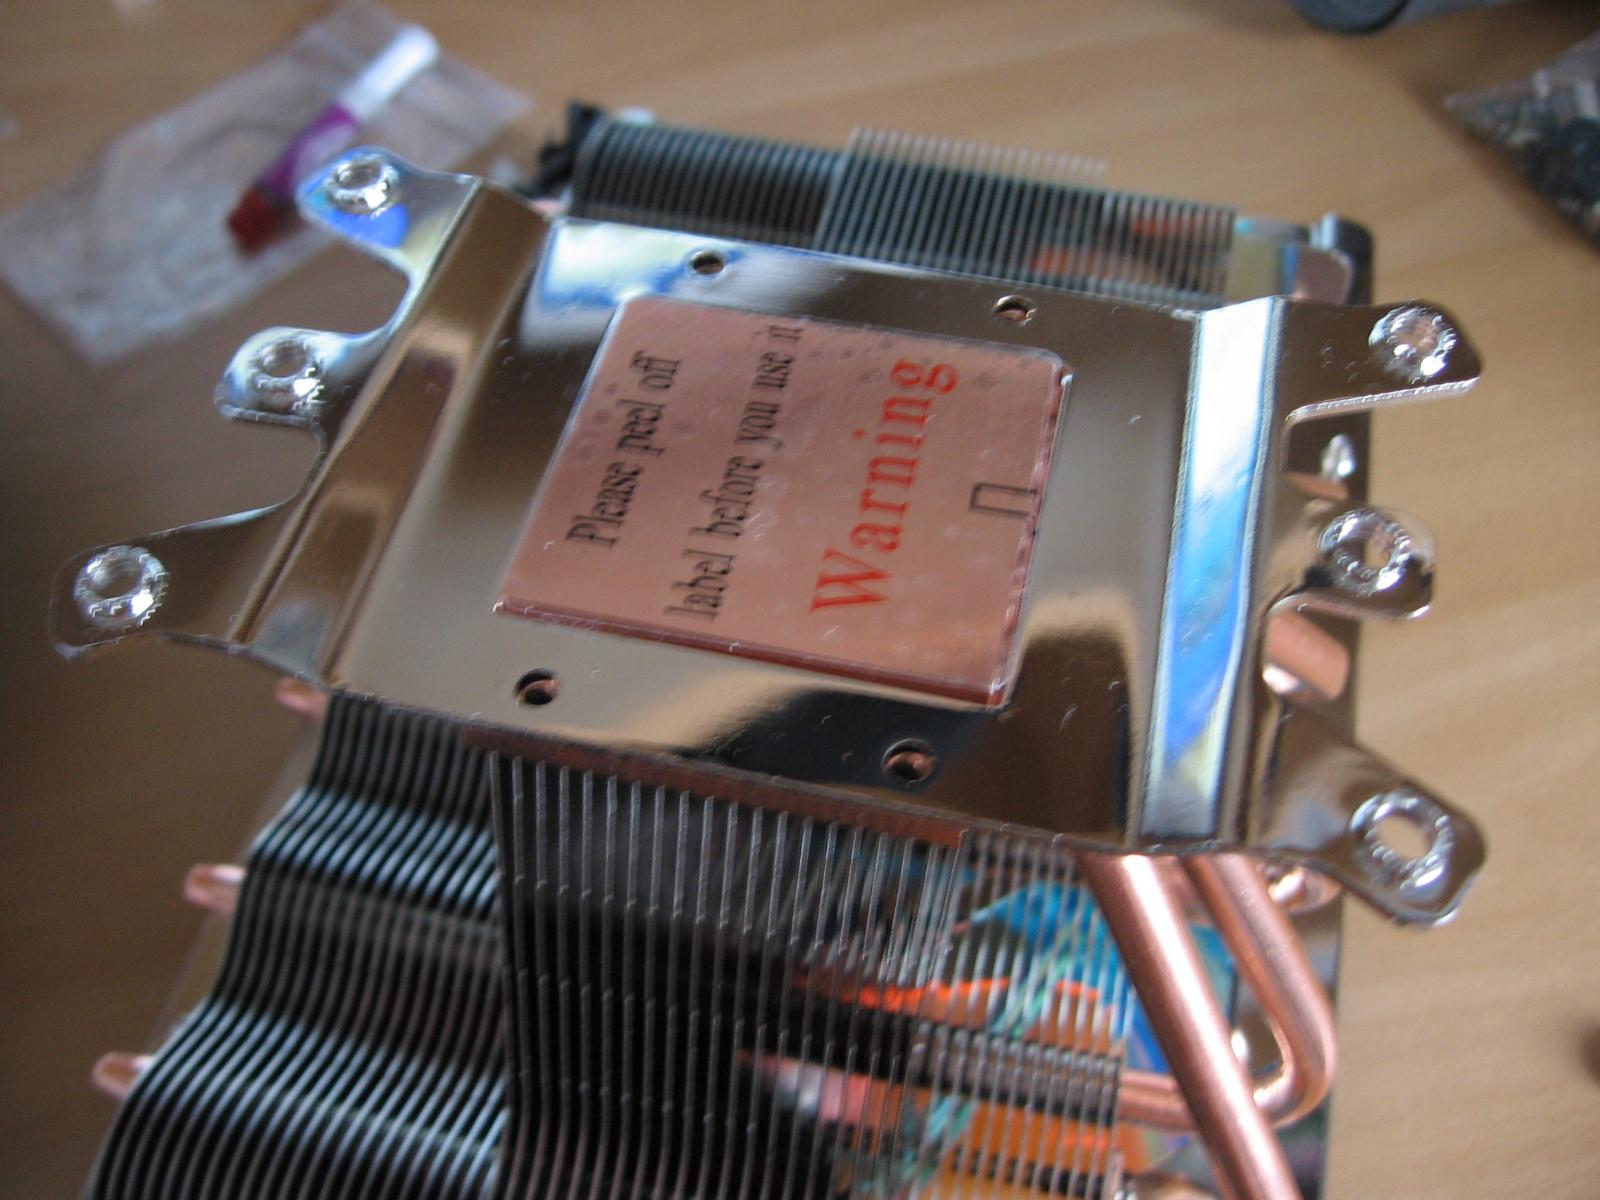 http://phothorizons.free.fr/GeminII%20049.jpg